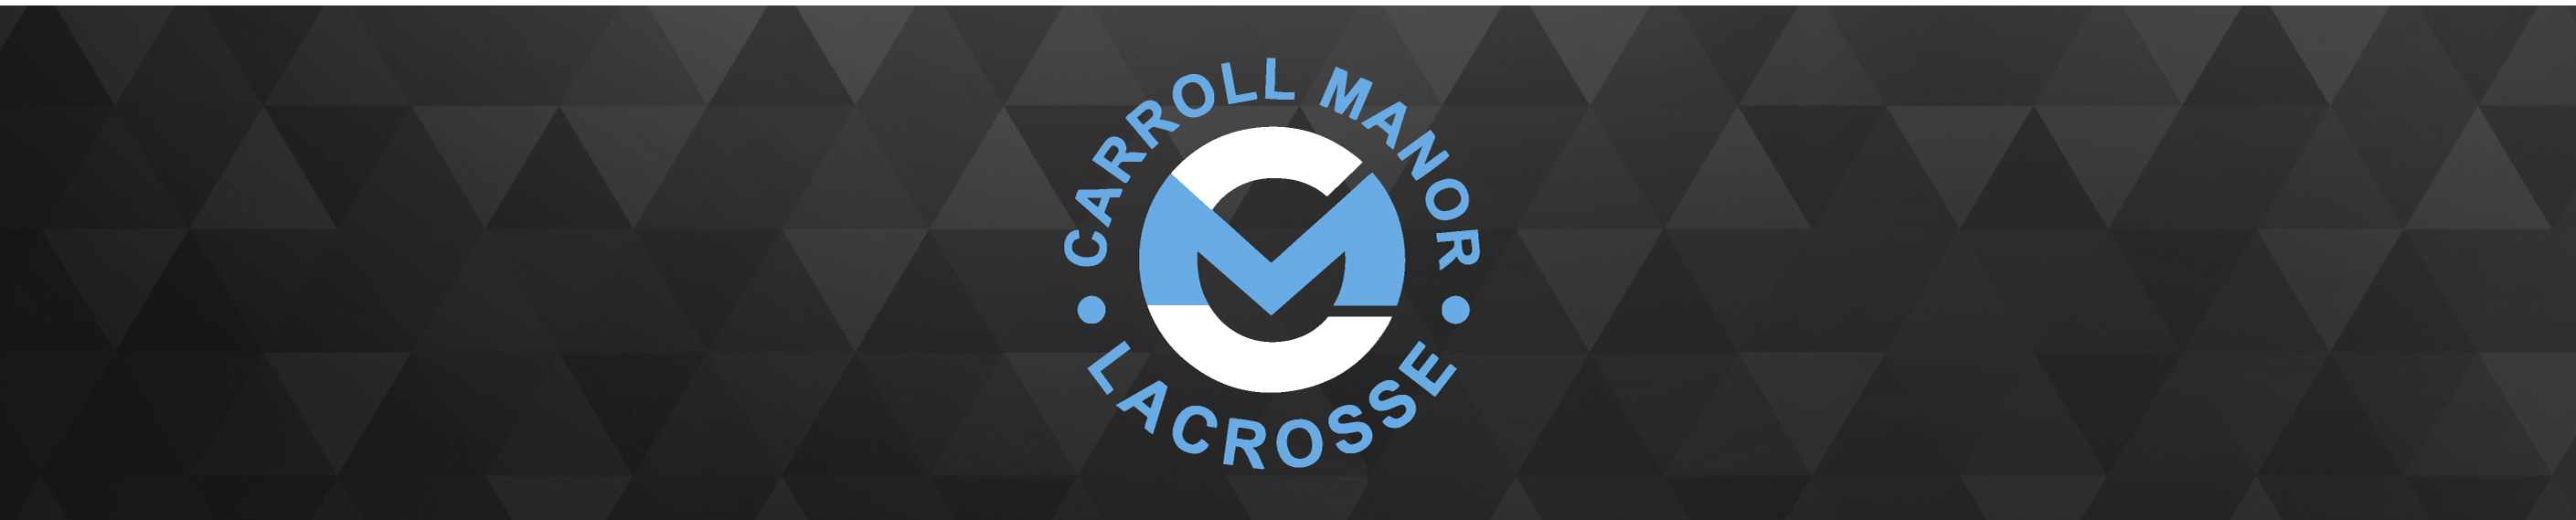 Carroll Manor Boys Lacrosse